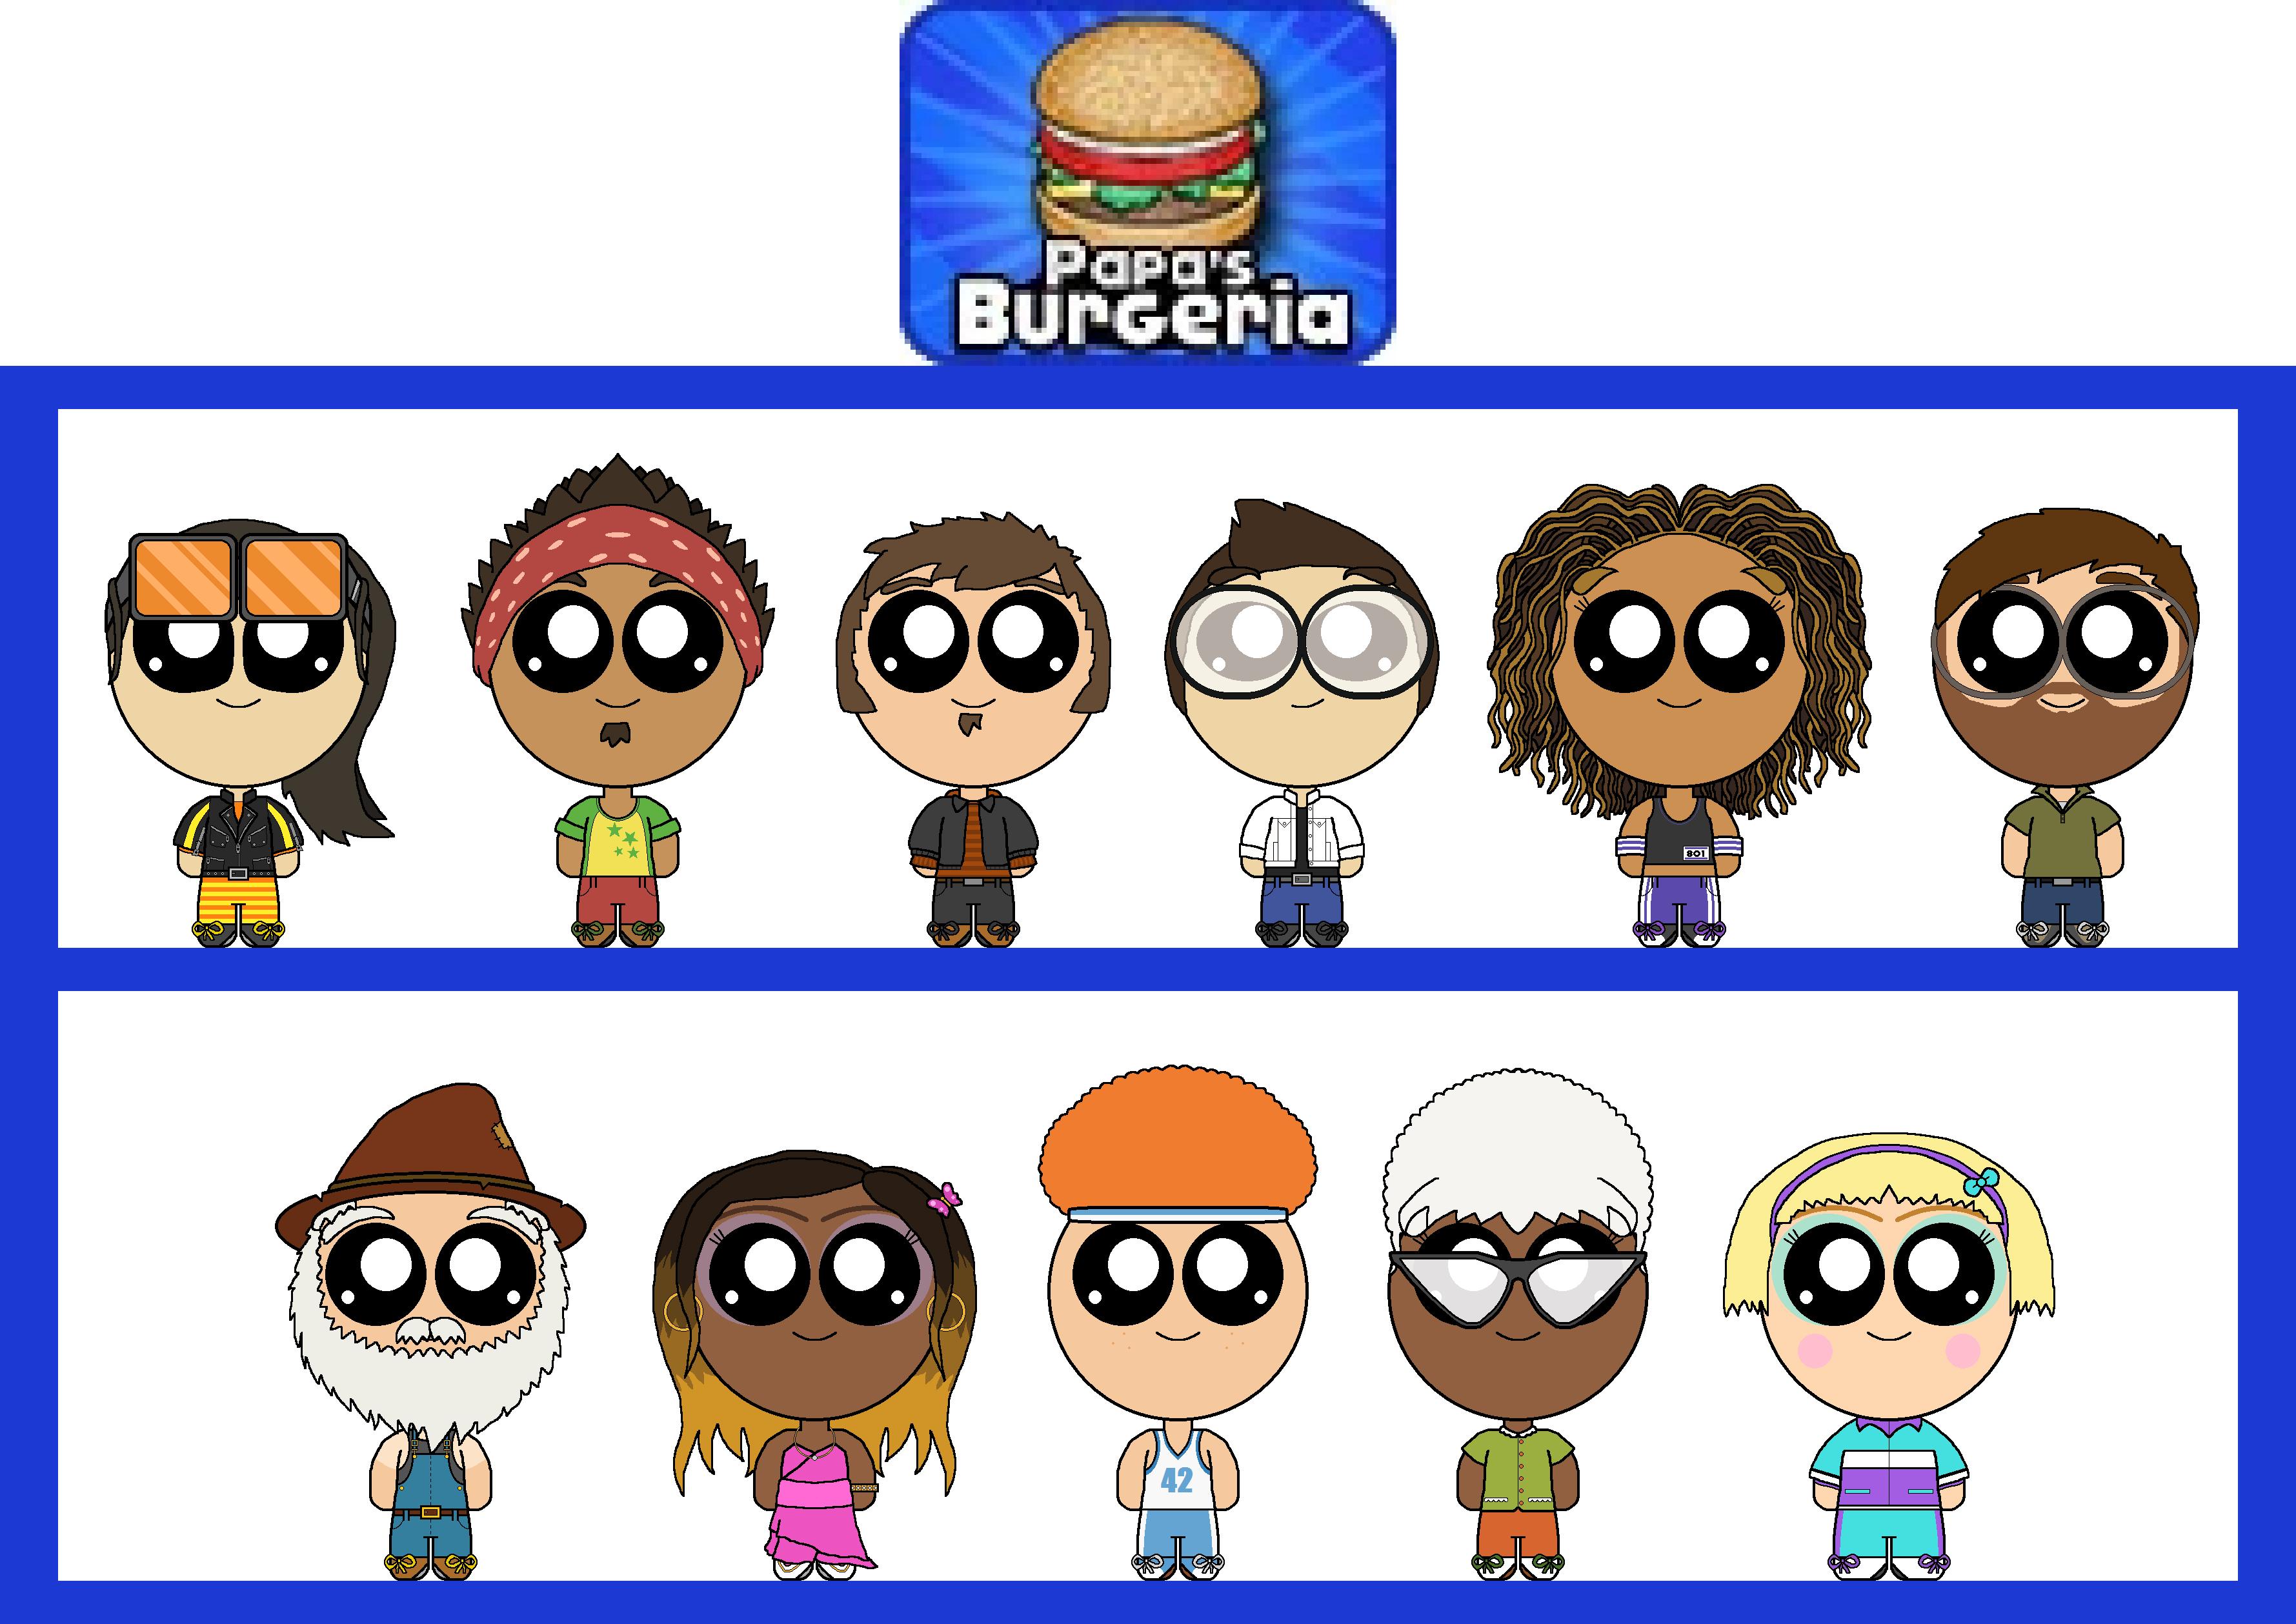 Flipline Studios Customers Burgeria By Thesweetpinkcutie On Deviantart